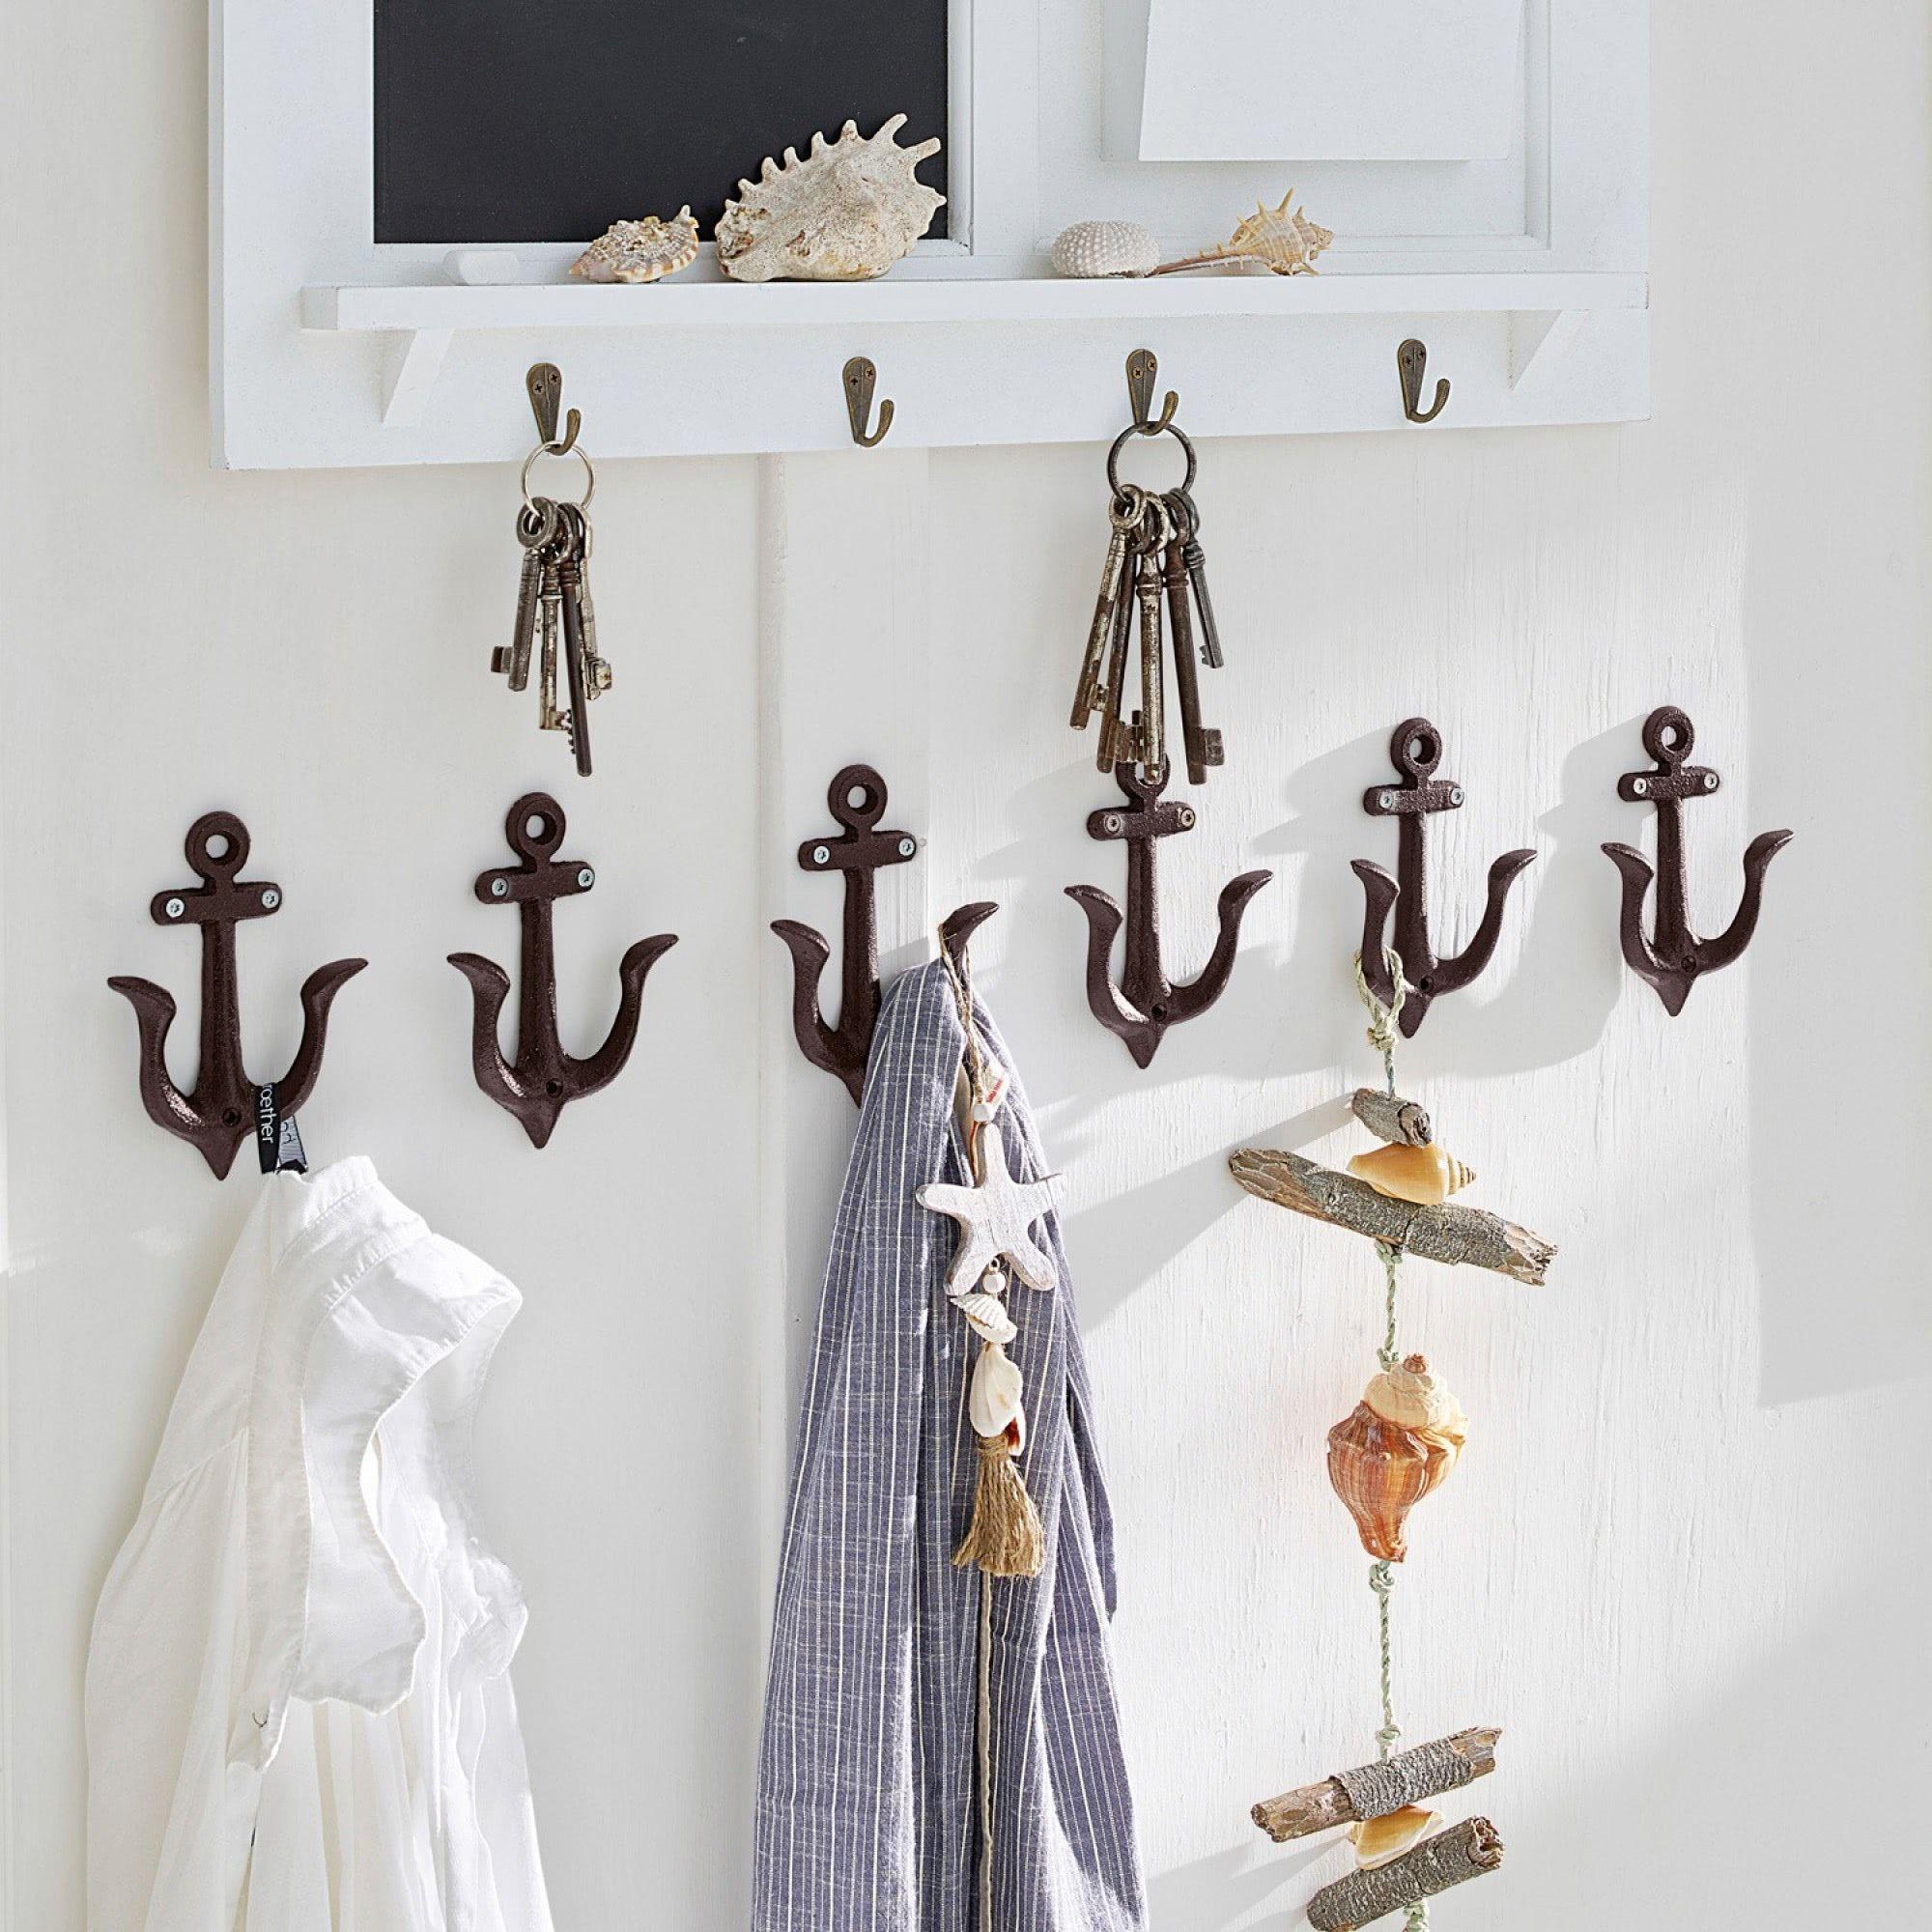 Haken 6er Set Ancre Dunkelbraun Loberon Kinderzimmer Dekor Maritime Einrichtung Dekoration Badezimmer